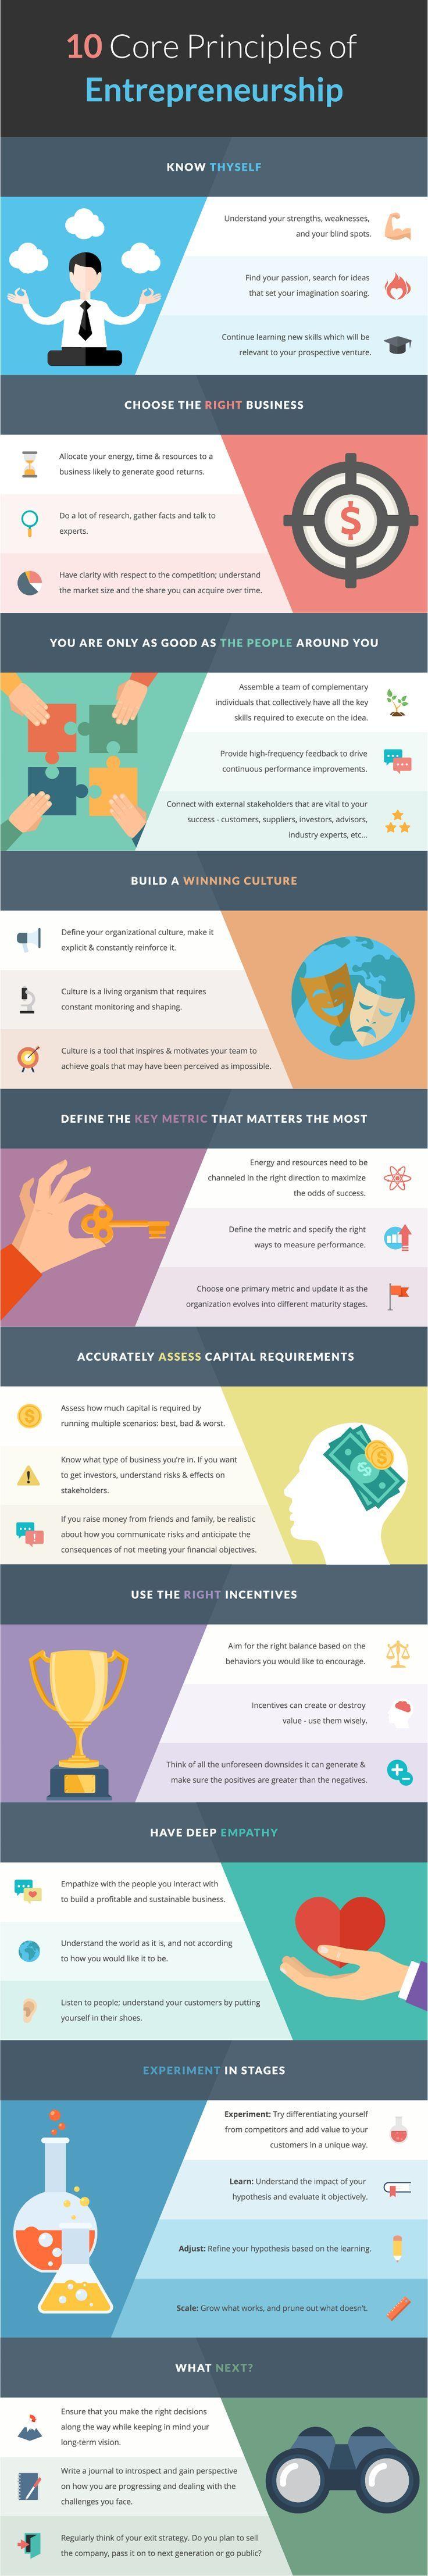 10 Core Principles Of Entrepreneurship #entrepreneur #Infographic: